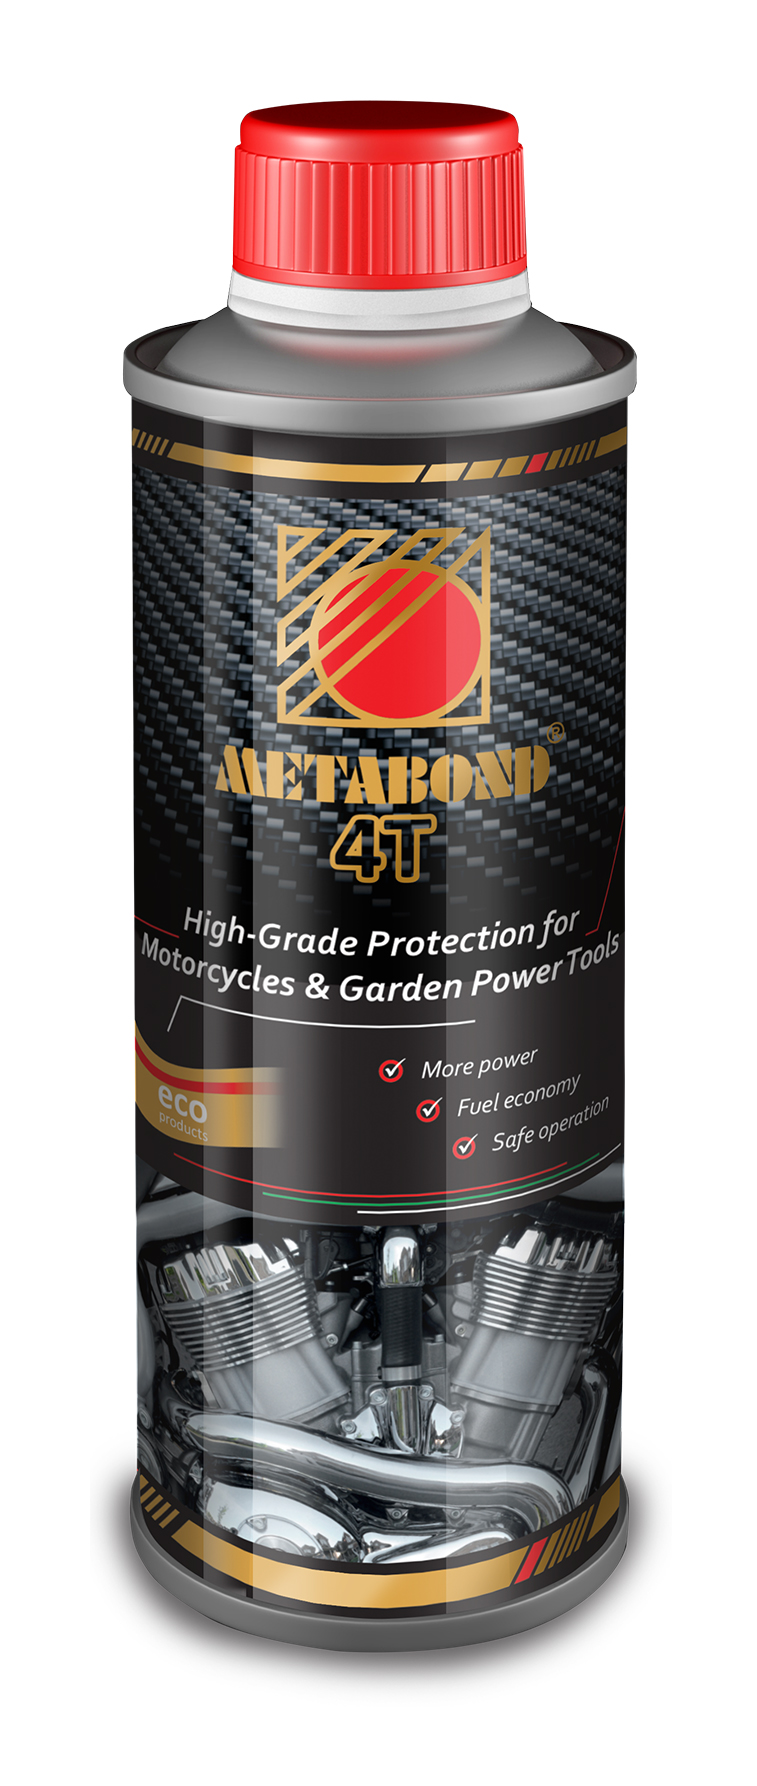 Metabond 4T Racing (produkt pro motocykly) 250ml